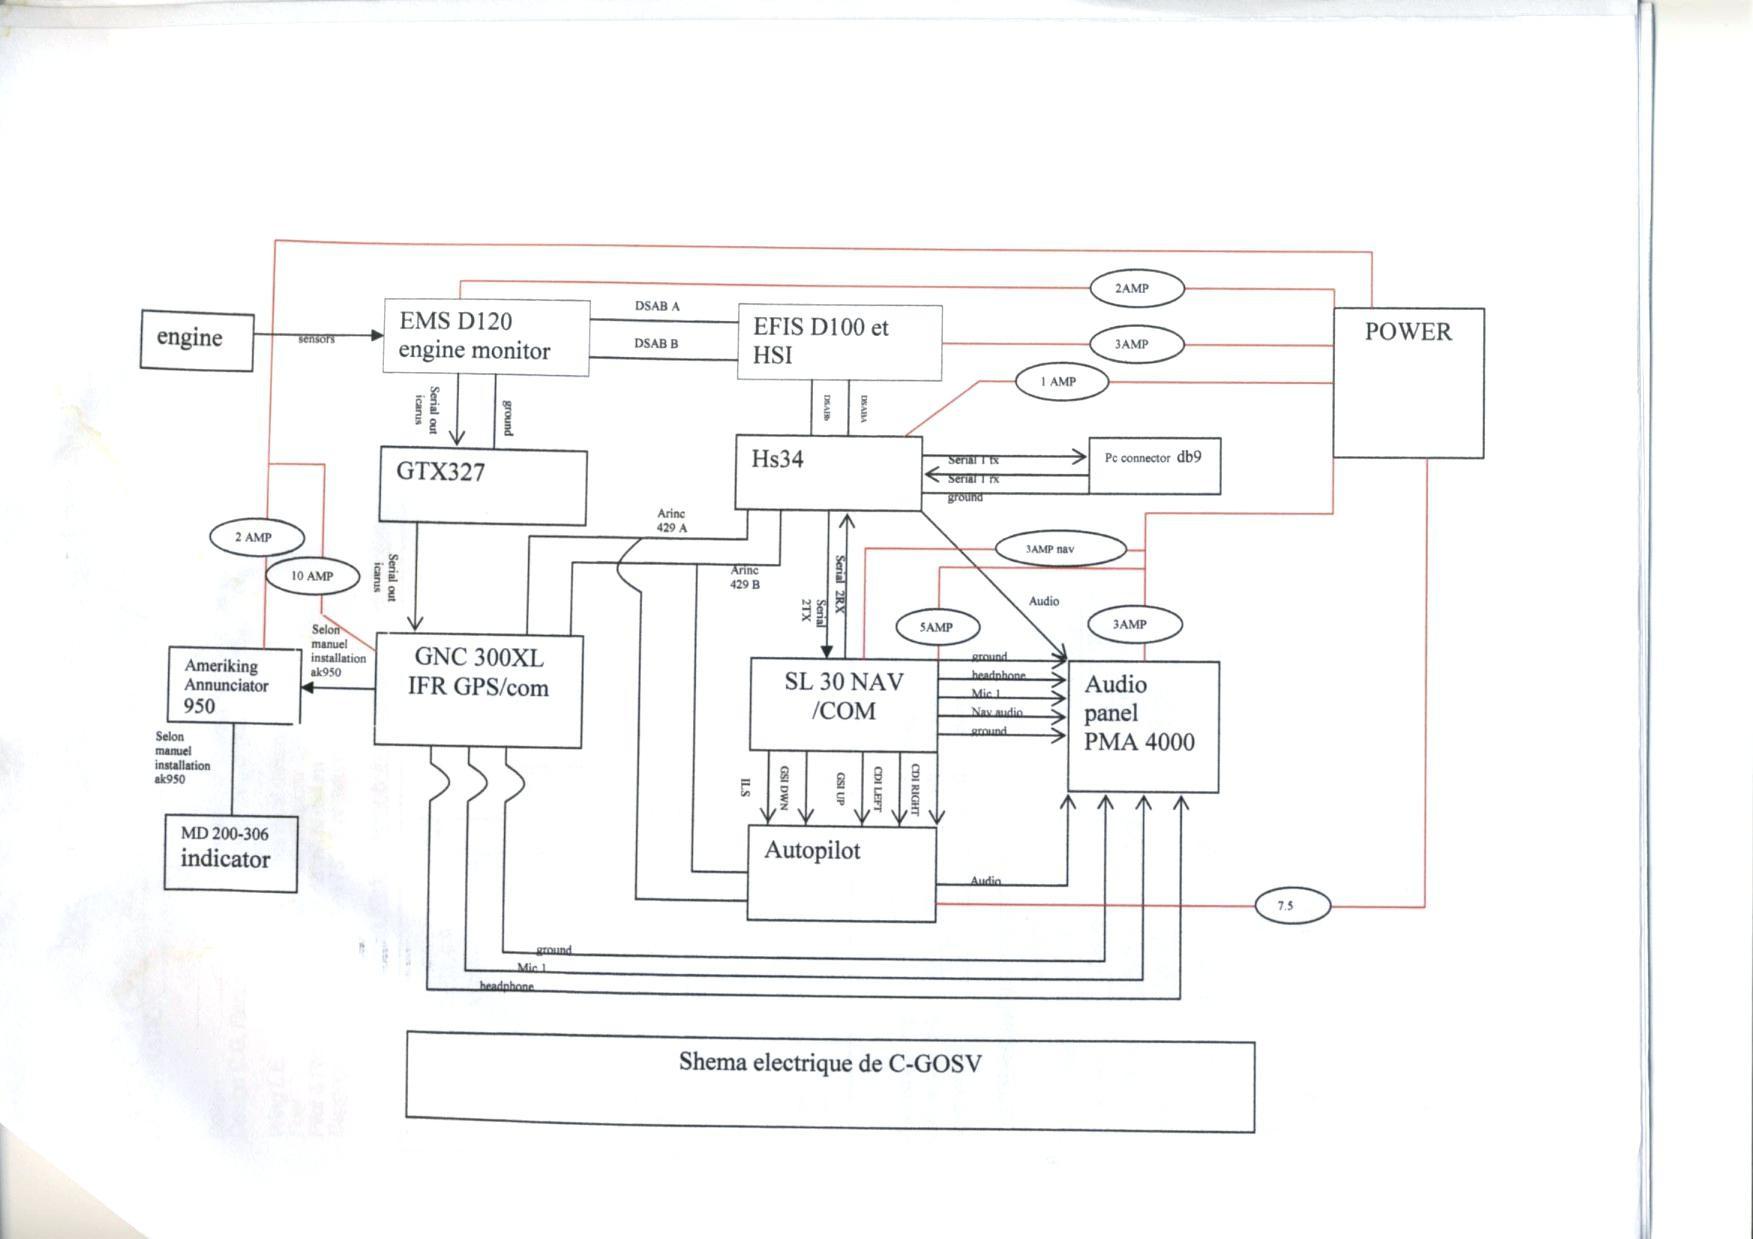 Garmin Transducer Wiring Diagram 4 Pin | Wiring Diagram Liry on